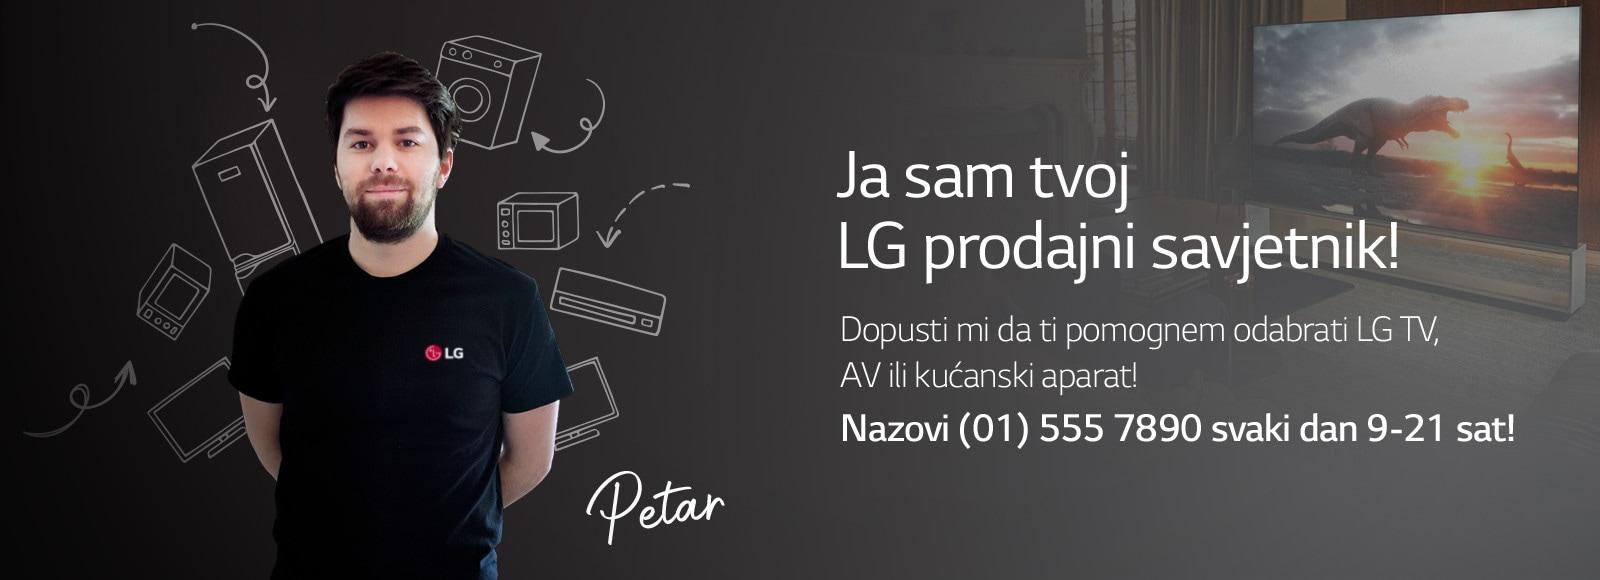 LG_PVA_1600x580_Final_Home_subpage